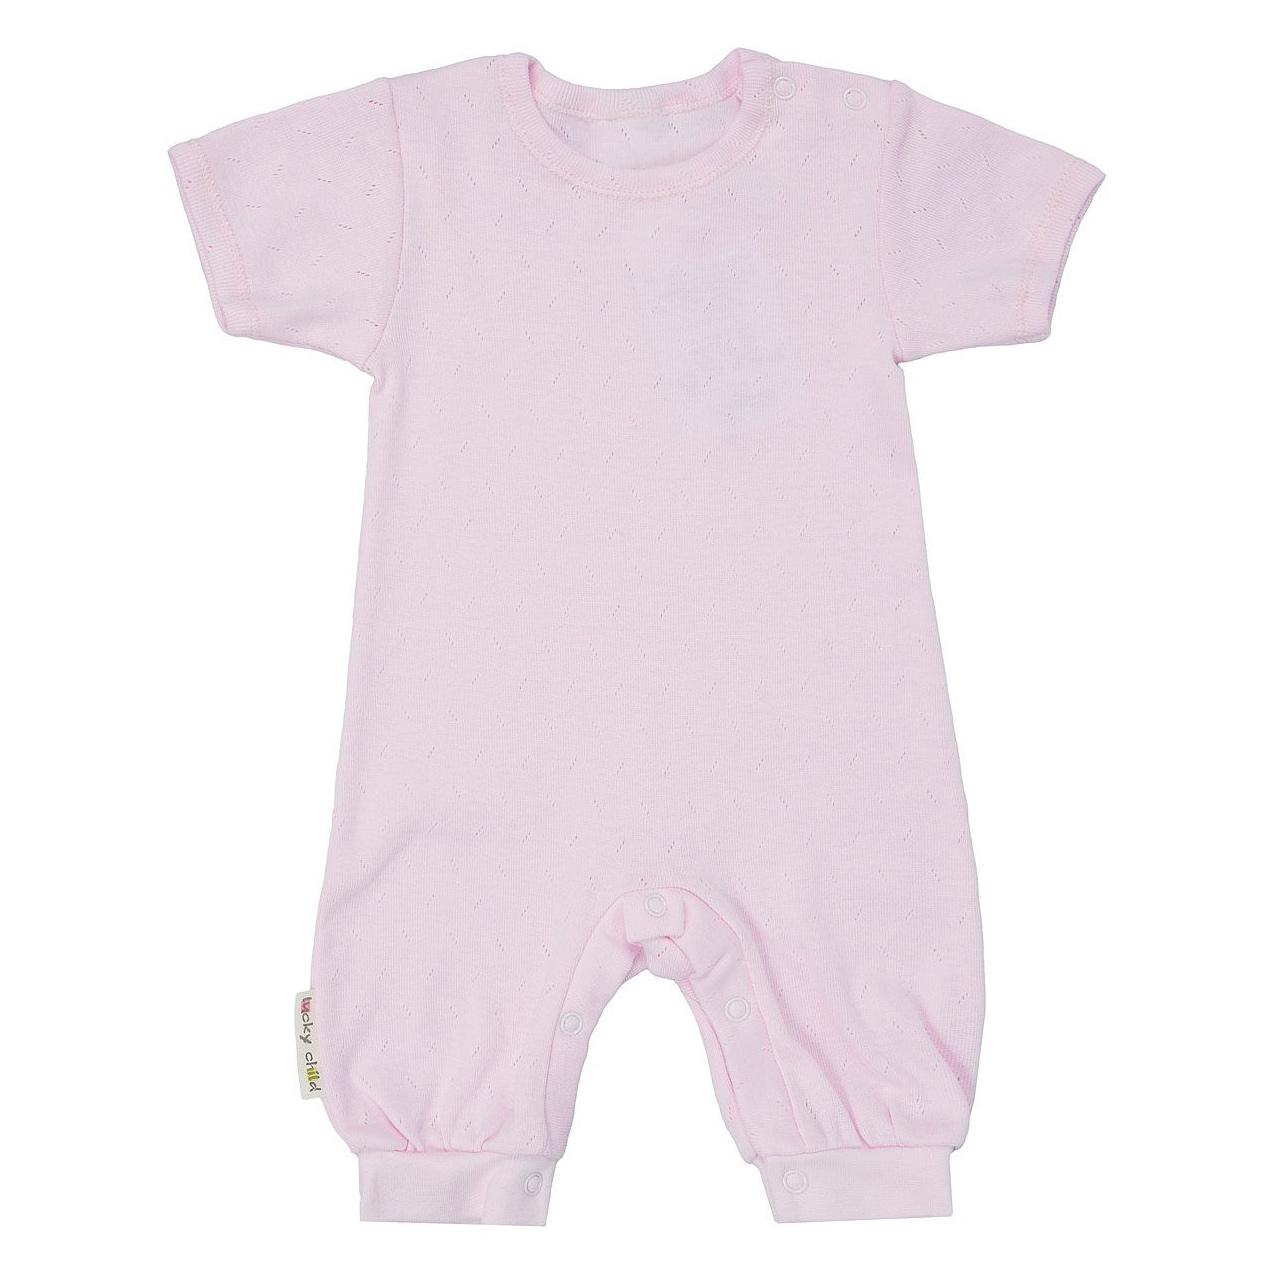 Фото - Песочник Lucky Child Ажур розовый 74-80 футболка lucky child ажур белая 74 80